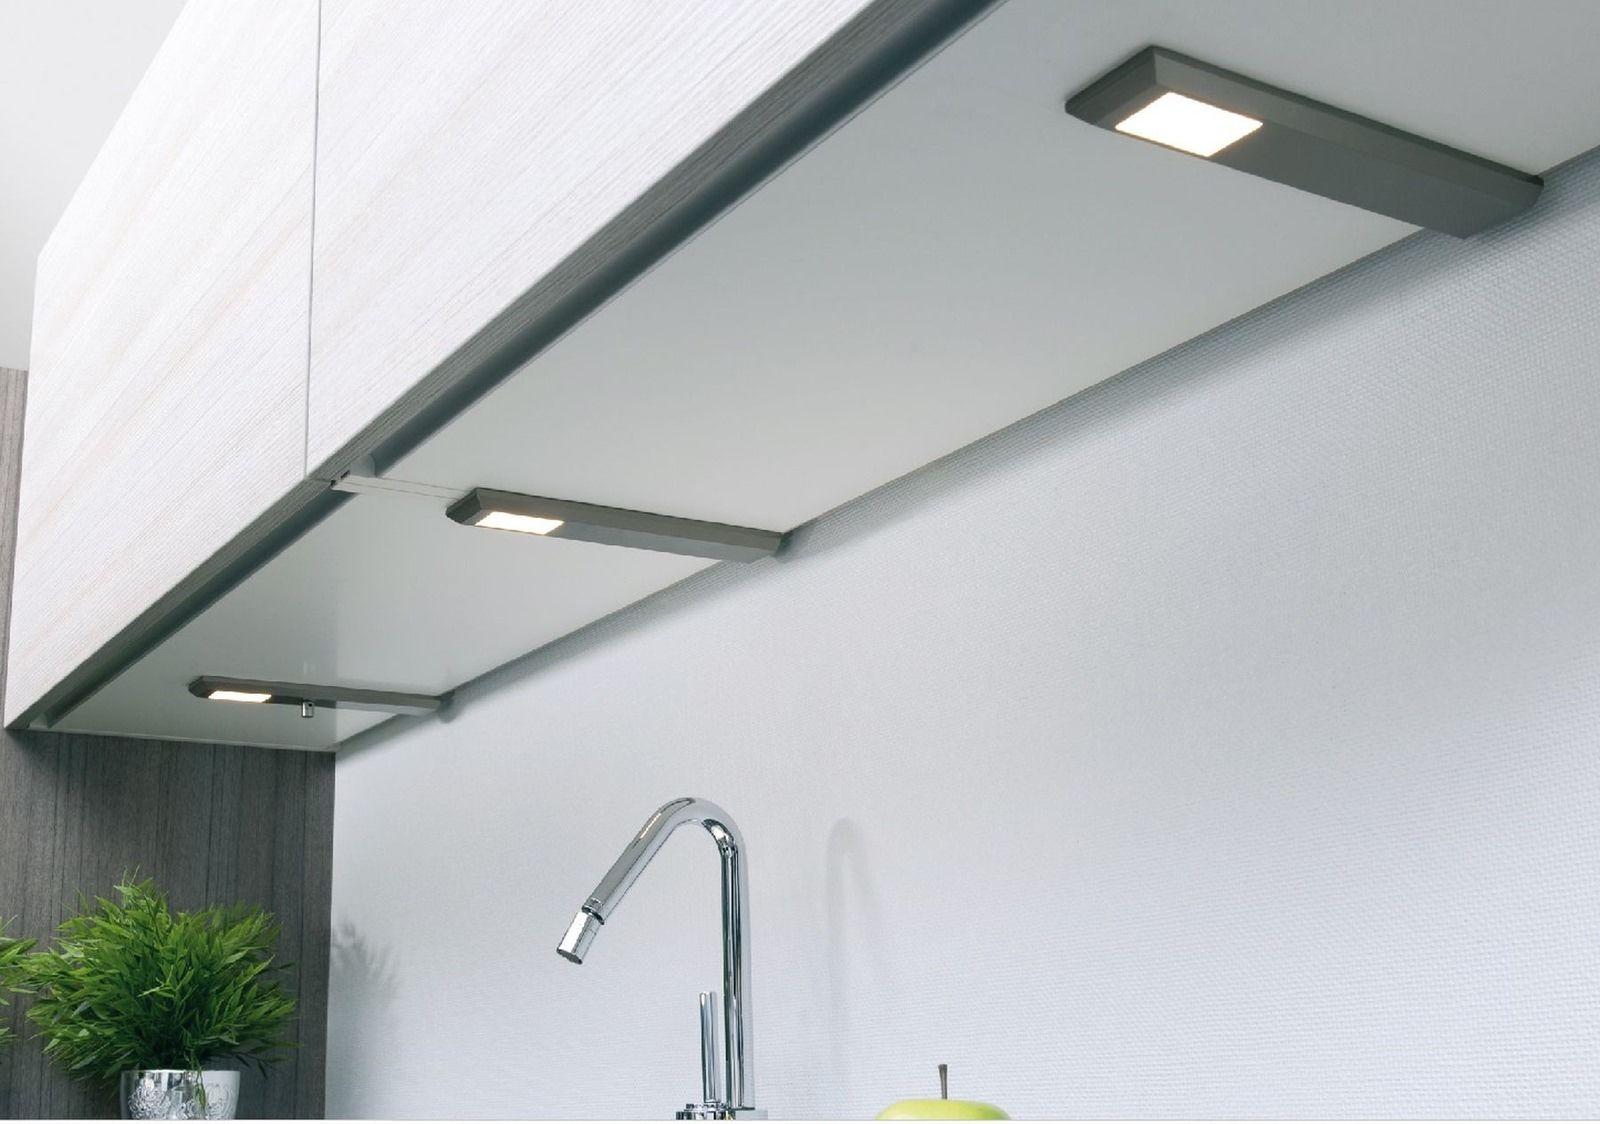 LED 3-er Set Küchen Unterbauleuchte Milano 3 x 6 W dimmbar Lampe ...